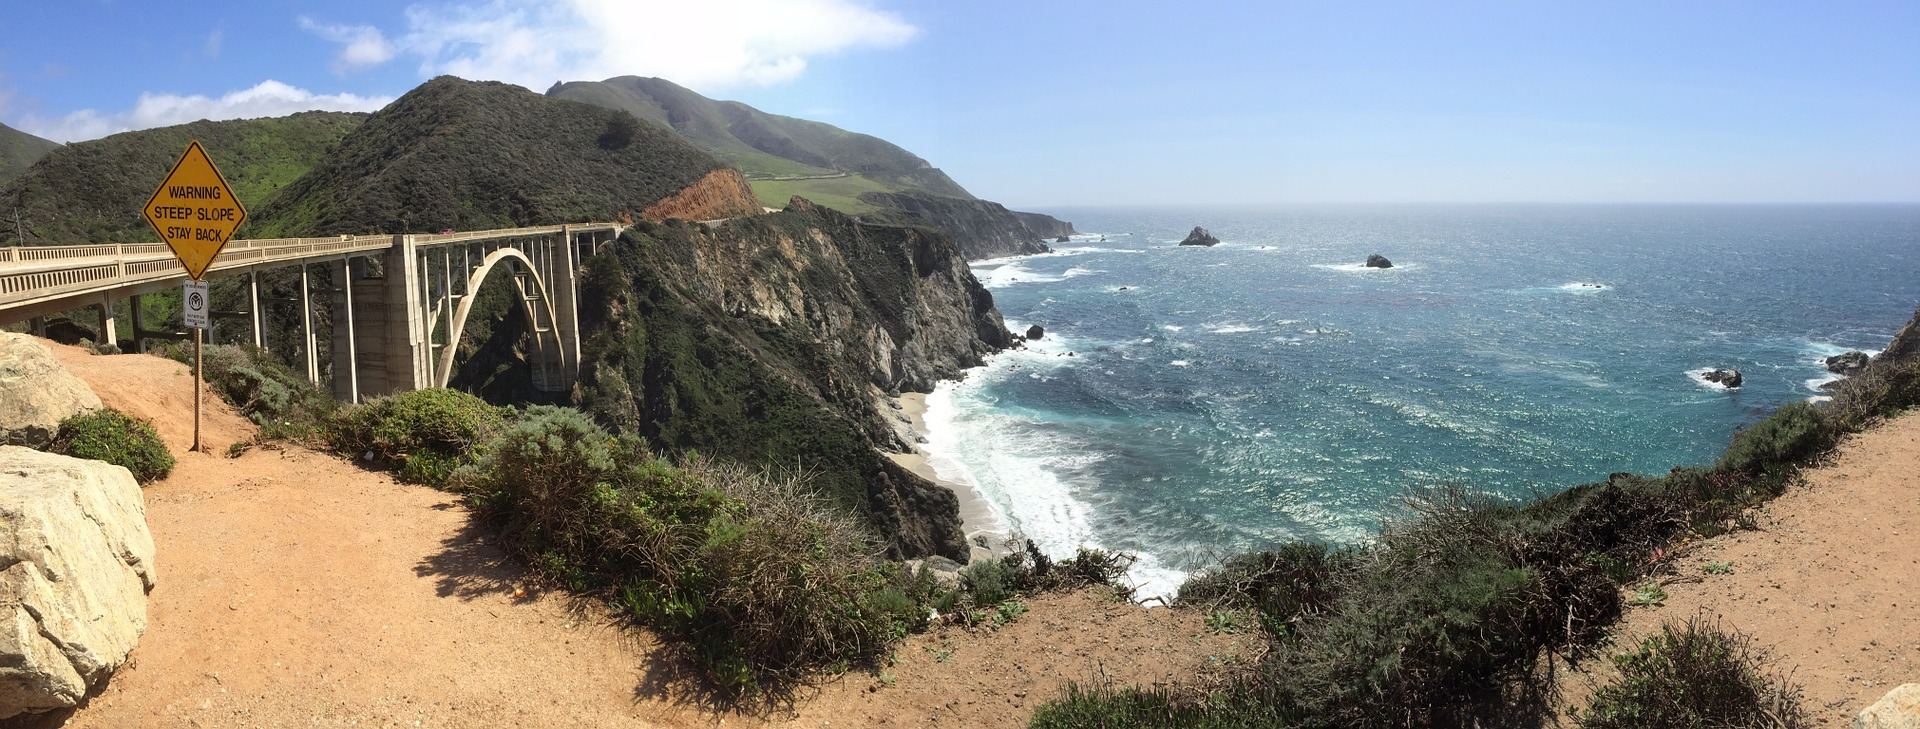 Road trip sur la mythique Highway 1 en Californie